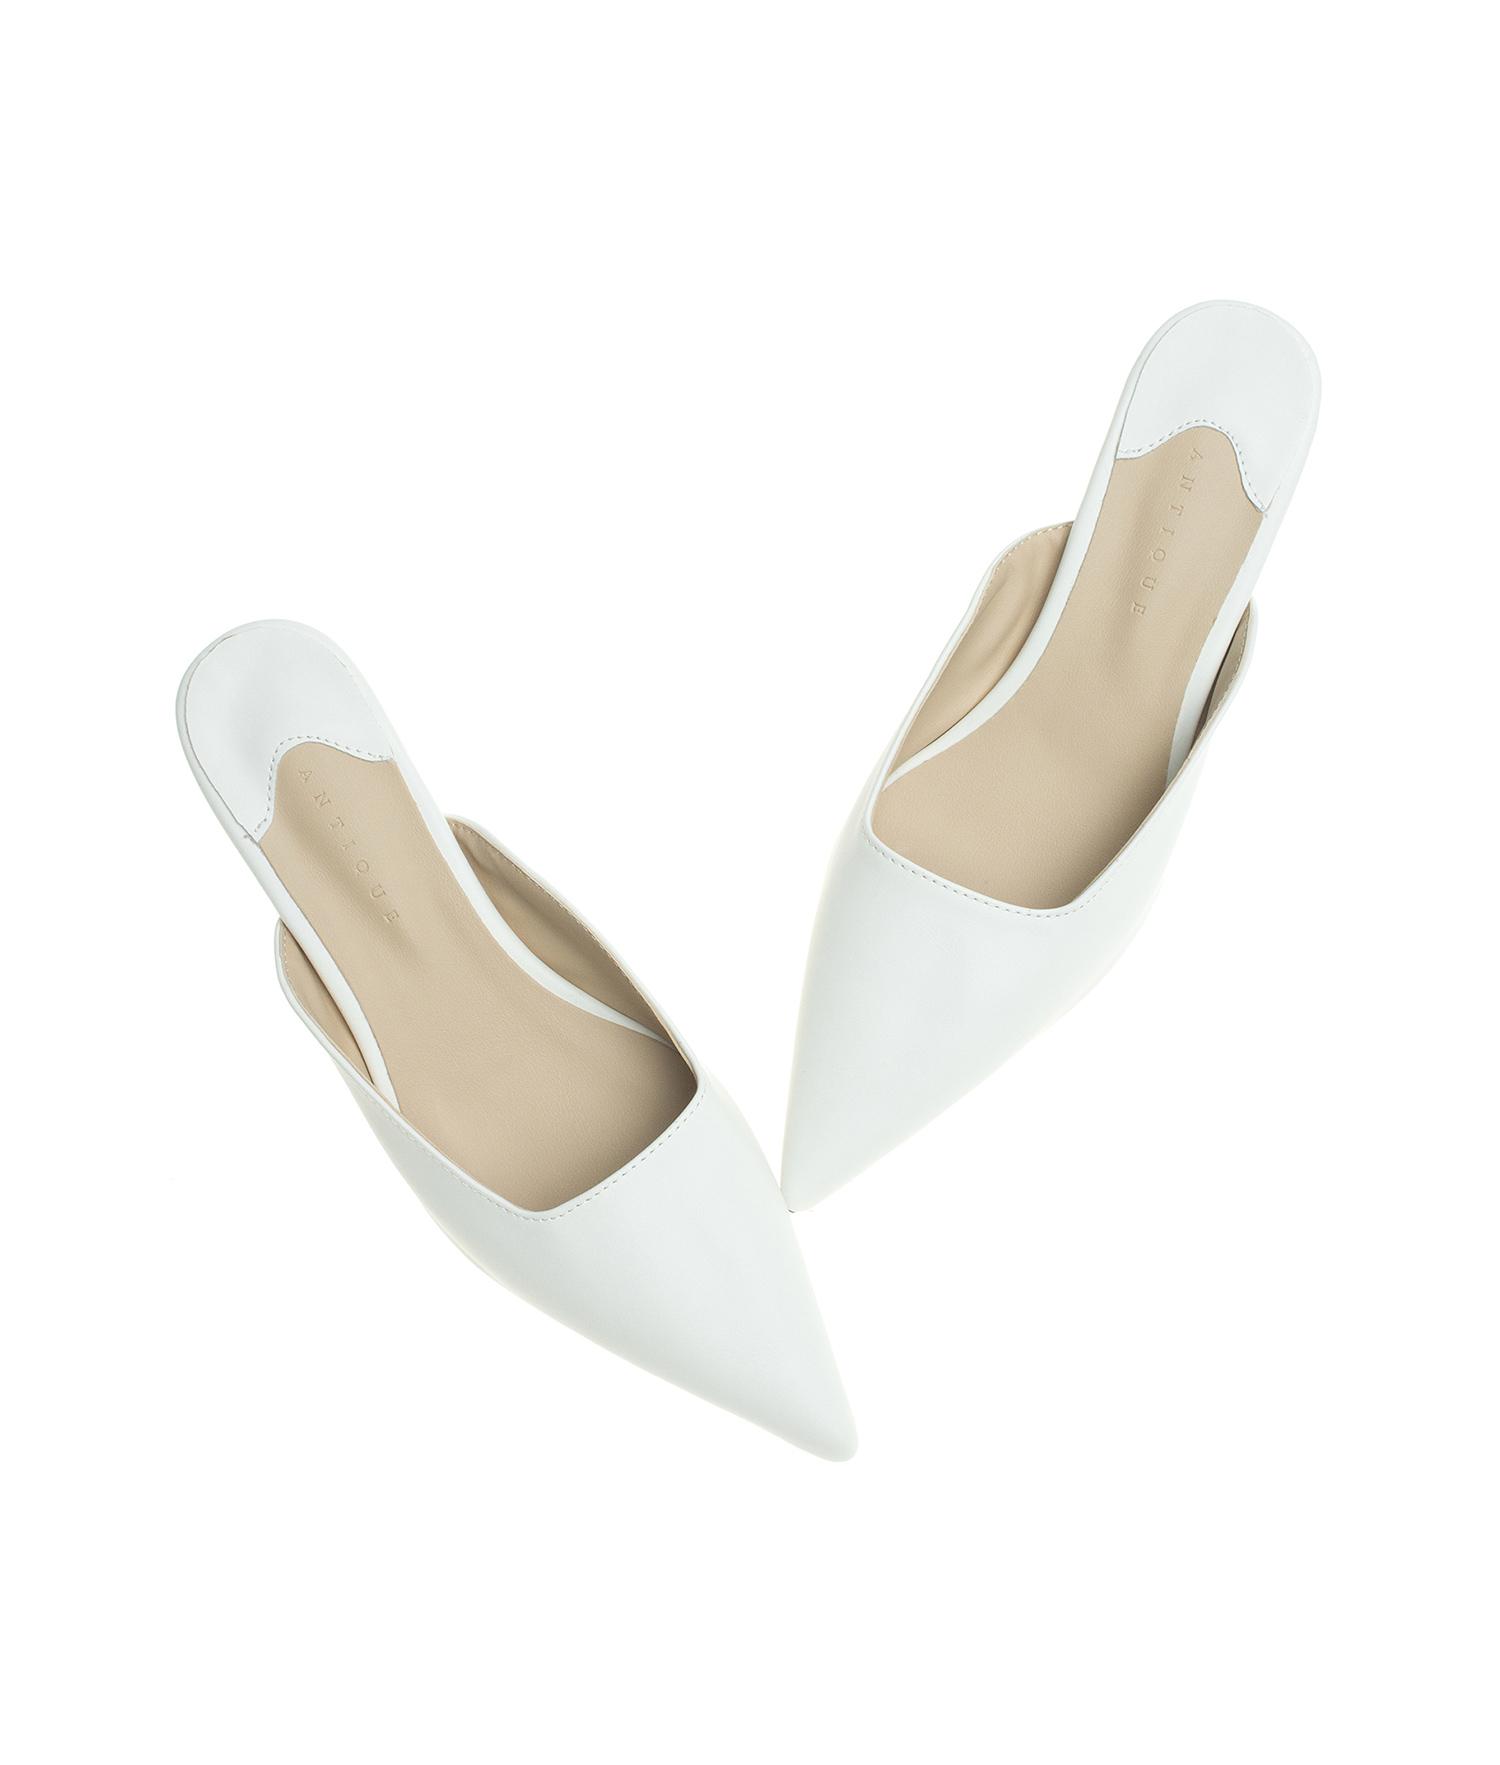 AnnaKastle Womens Pointed Toe Kitten Heel Mule Pumps White